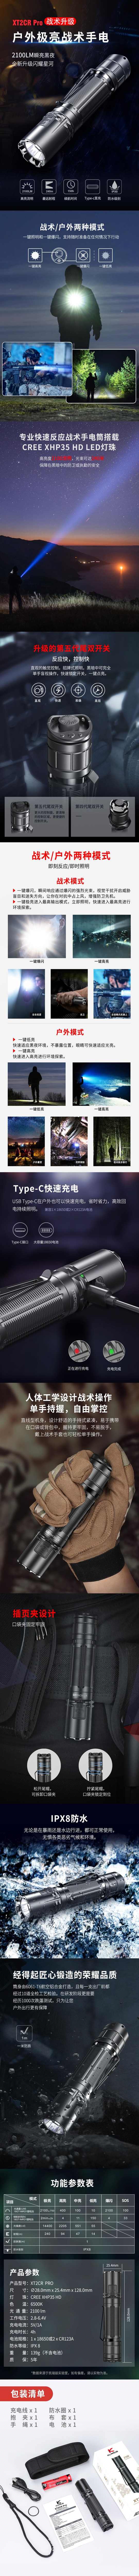 0.KLARUS XT2CR Pro 2100流明 戰術雙尾按手電筒